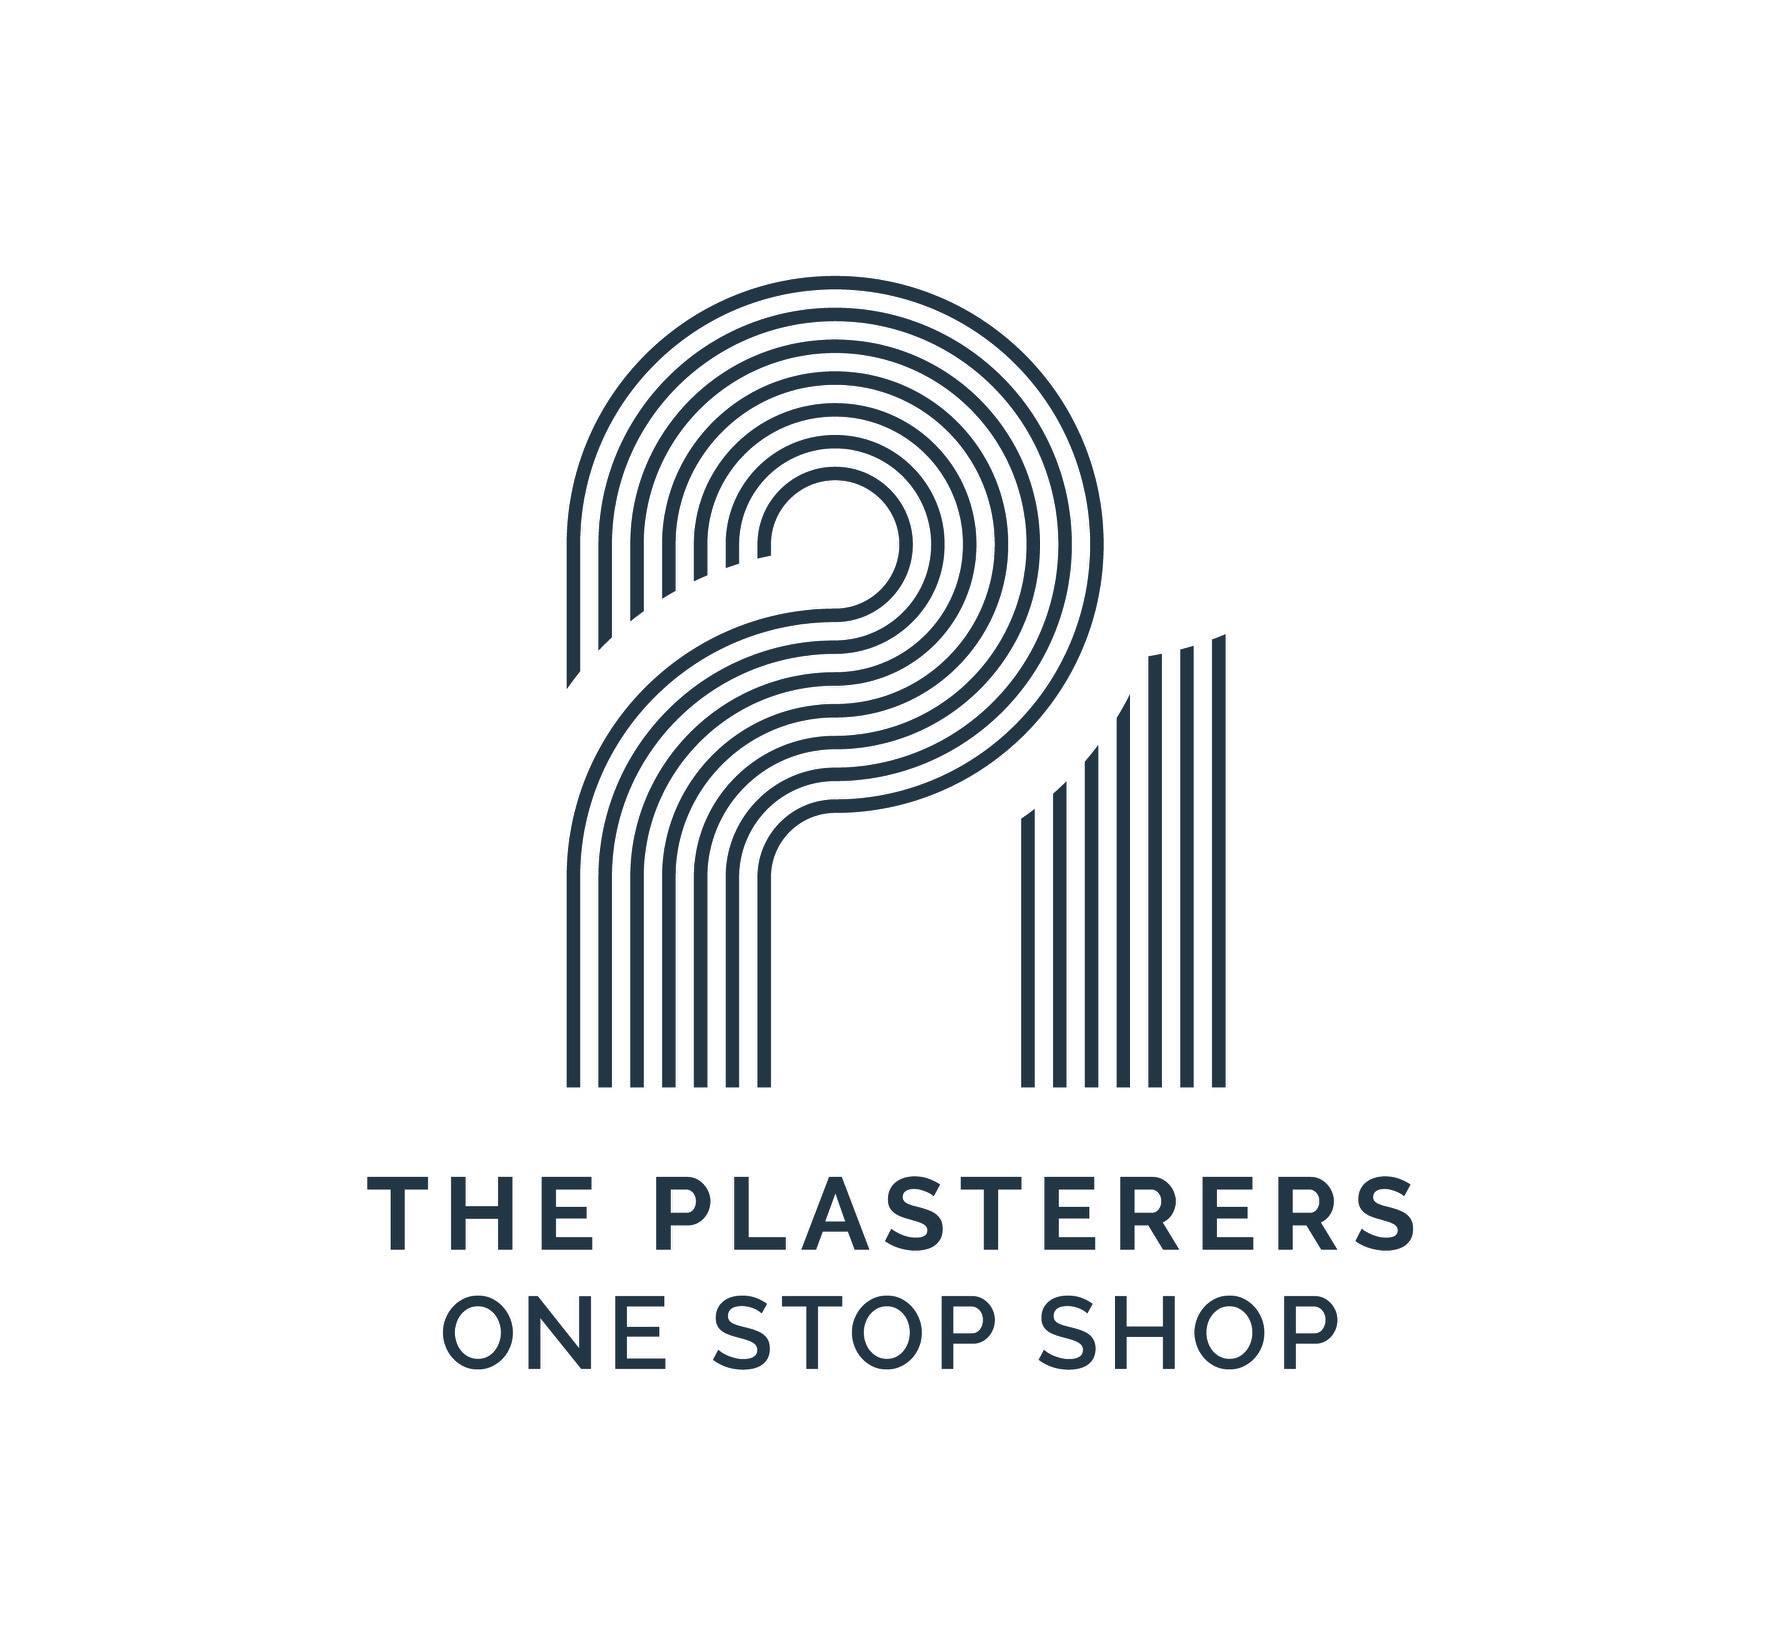 P1 - The Plasterers 1 Stop Shop